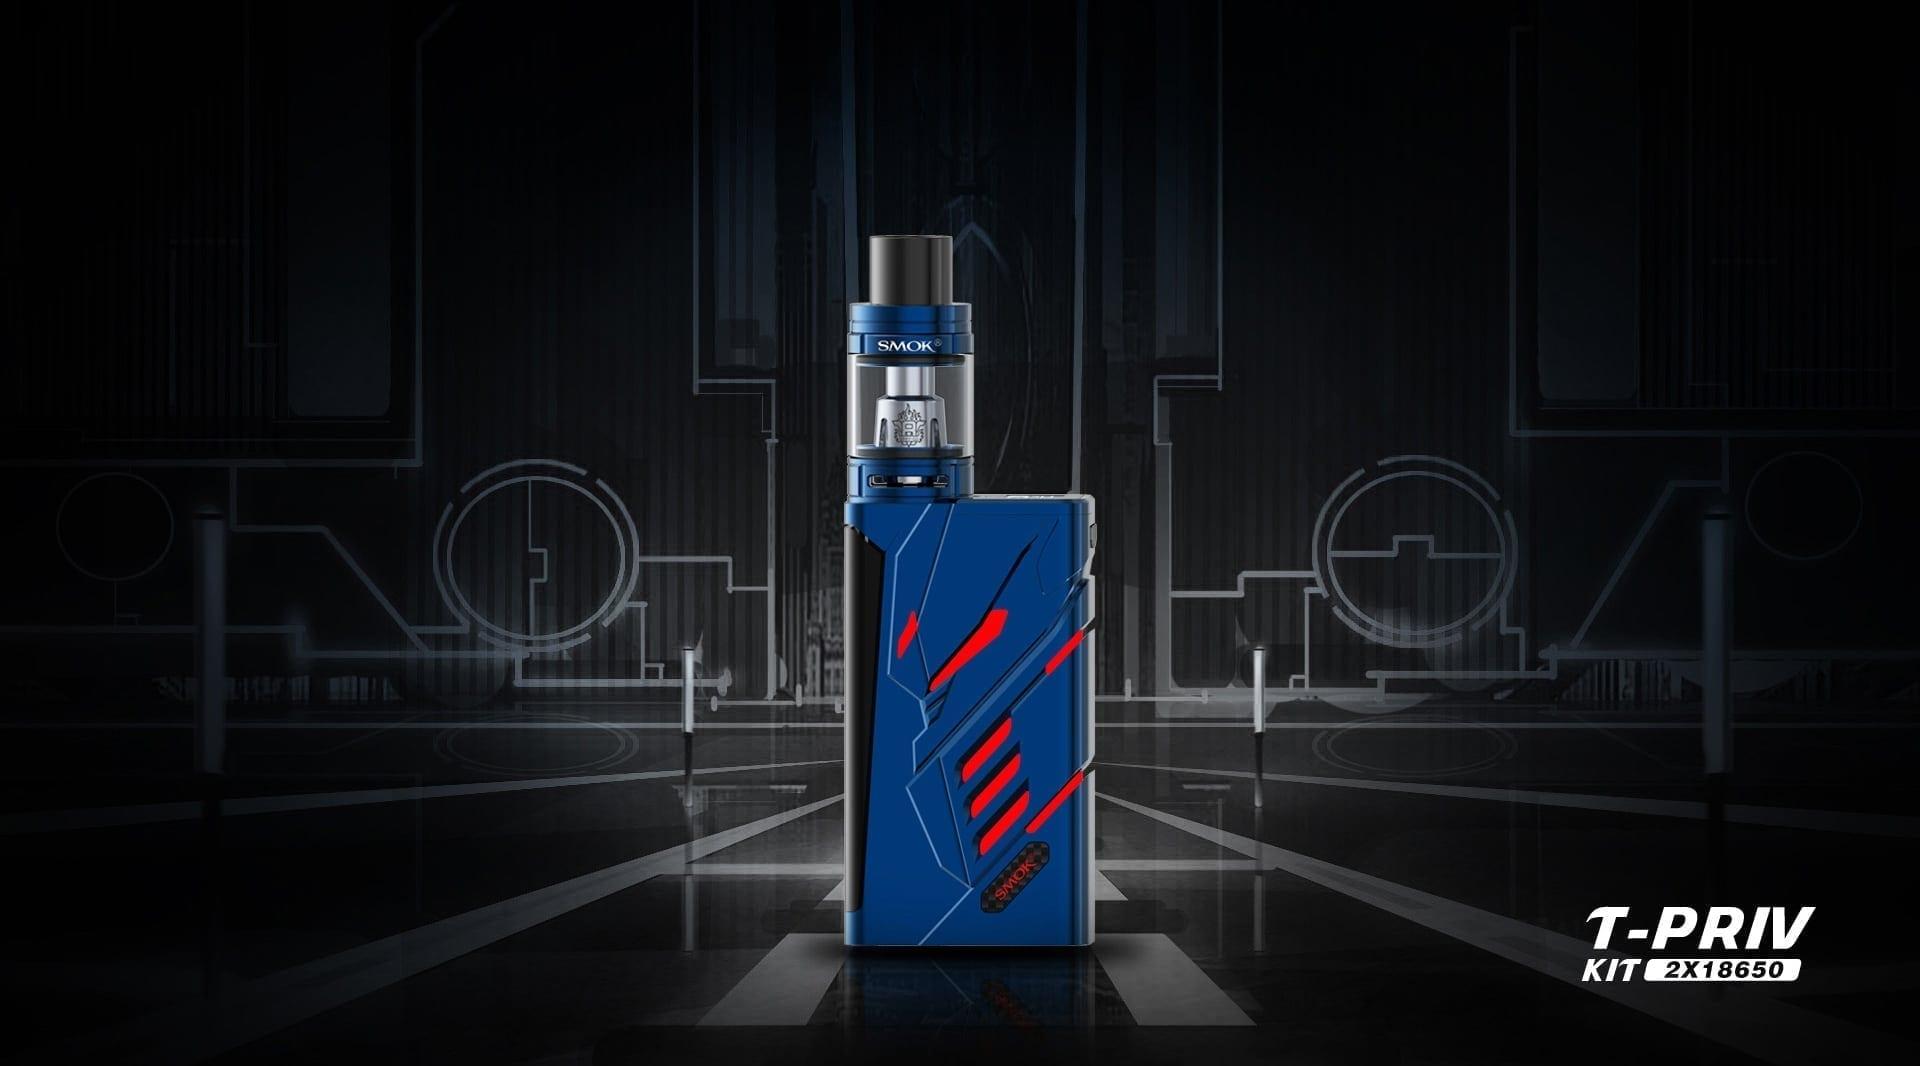 T-Priv Kit by Smok | Supernova Smoke & Vape Shop